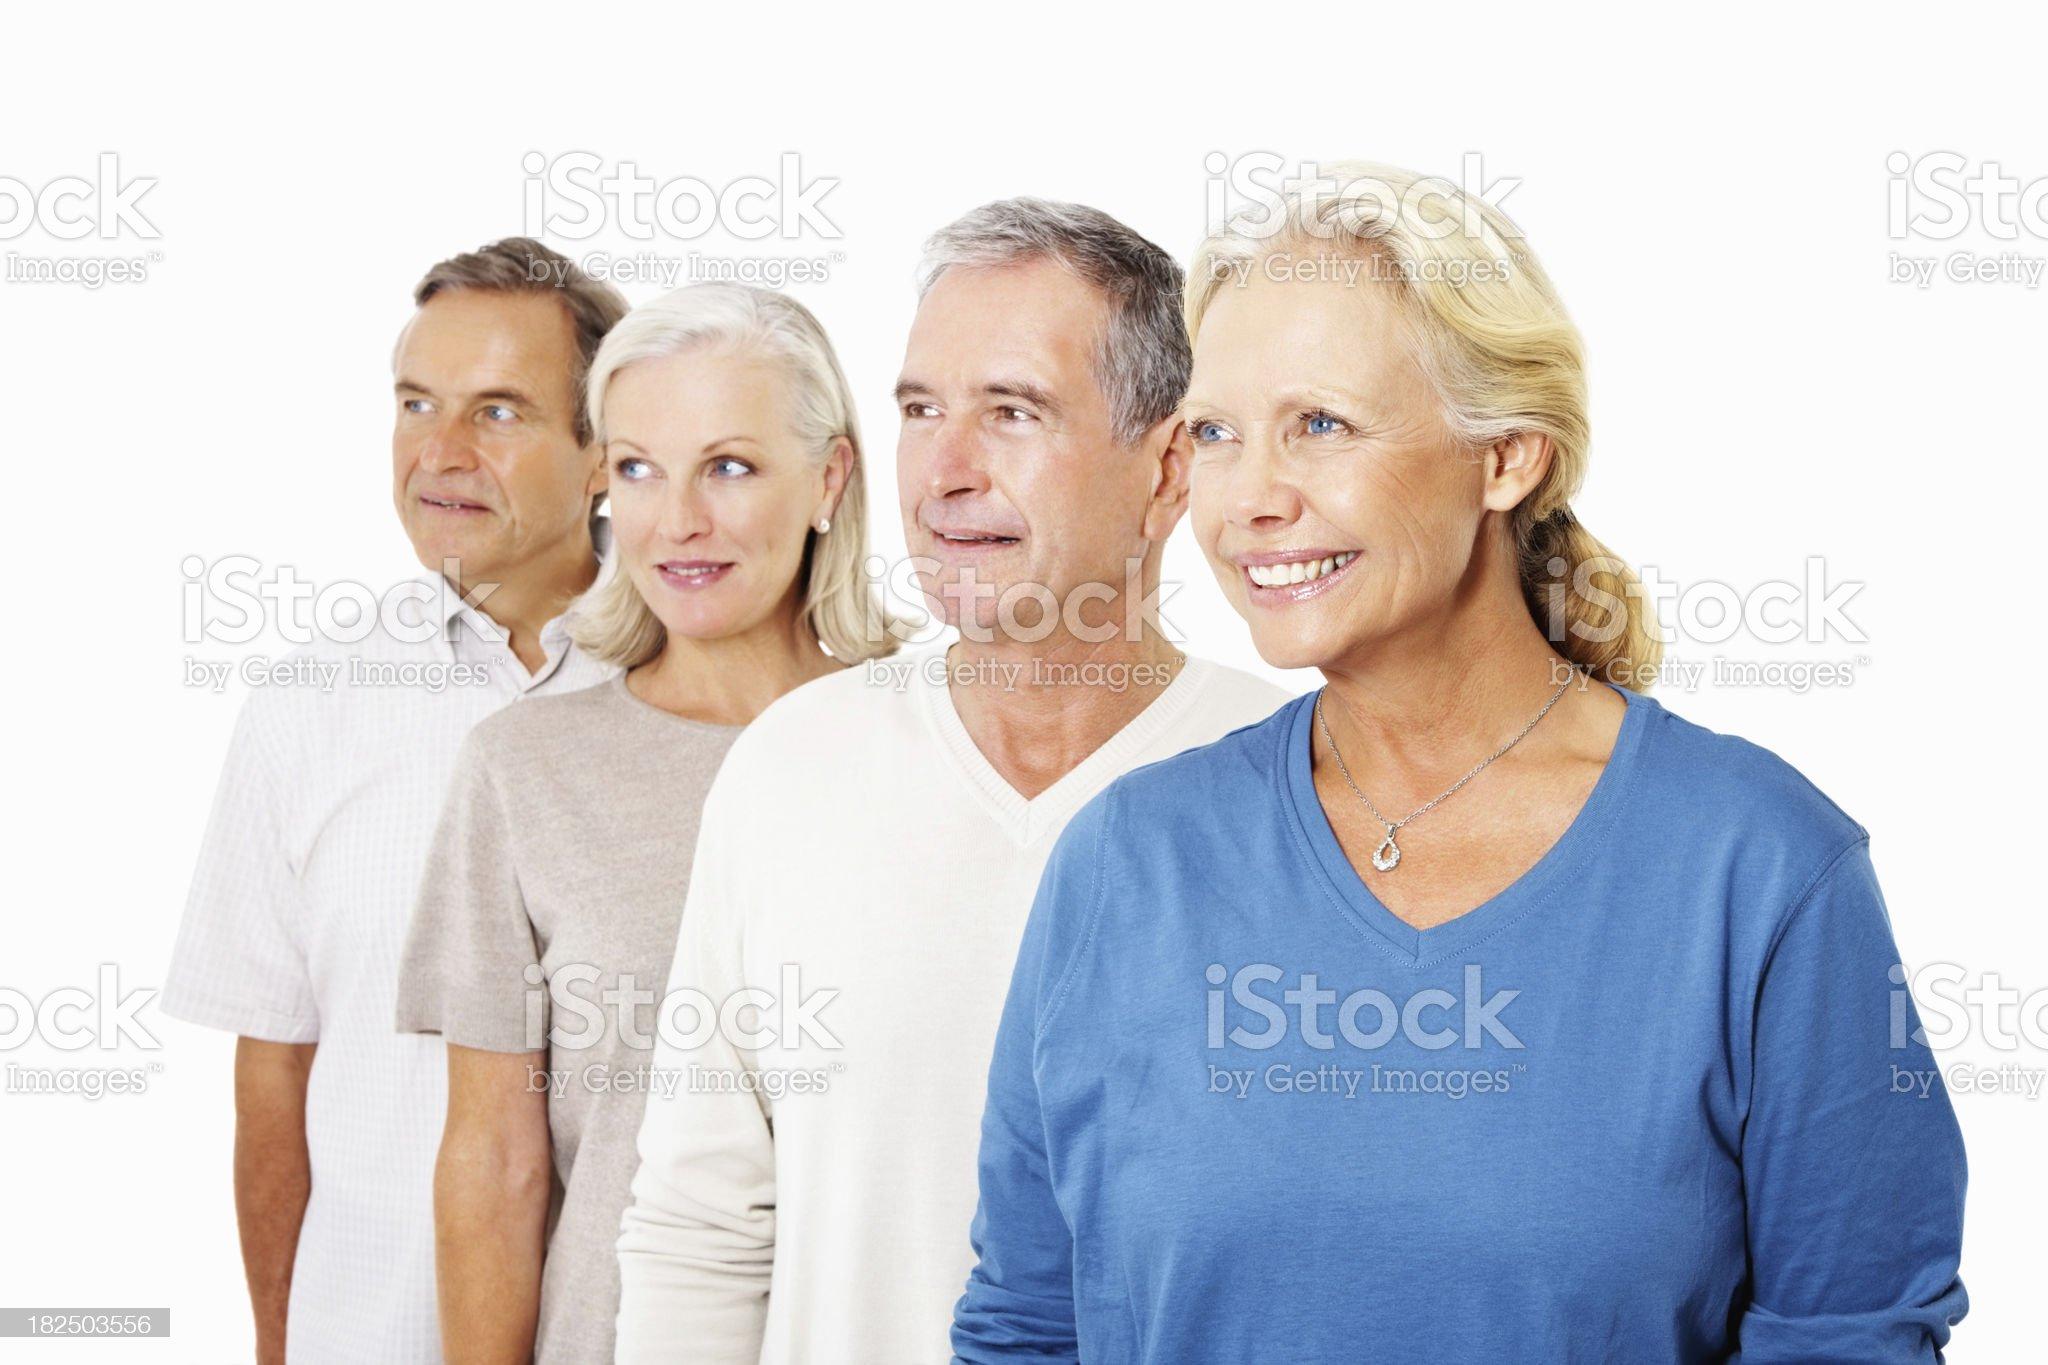 Smiling senior people looking at something interesting royalty-free stock photo